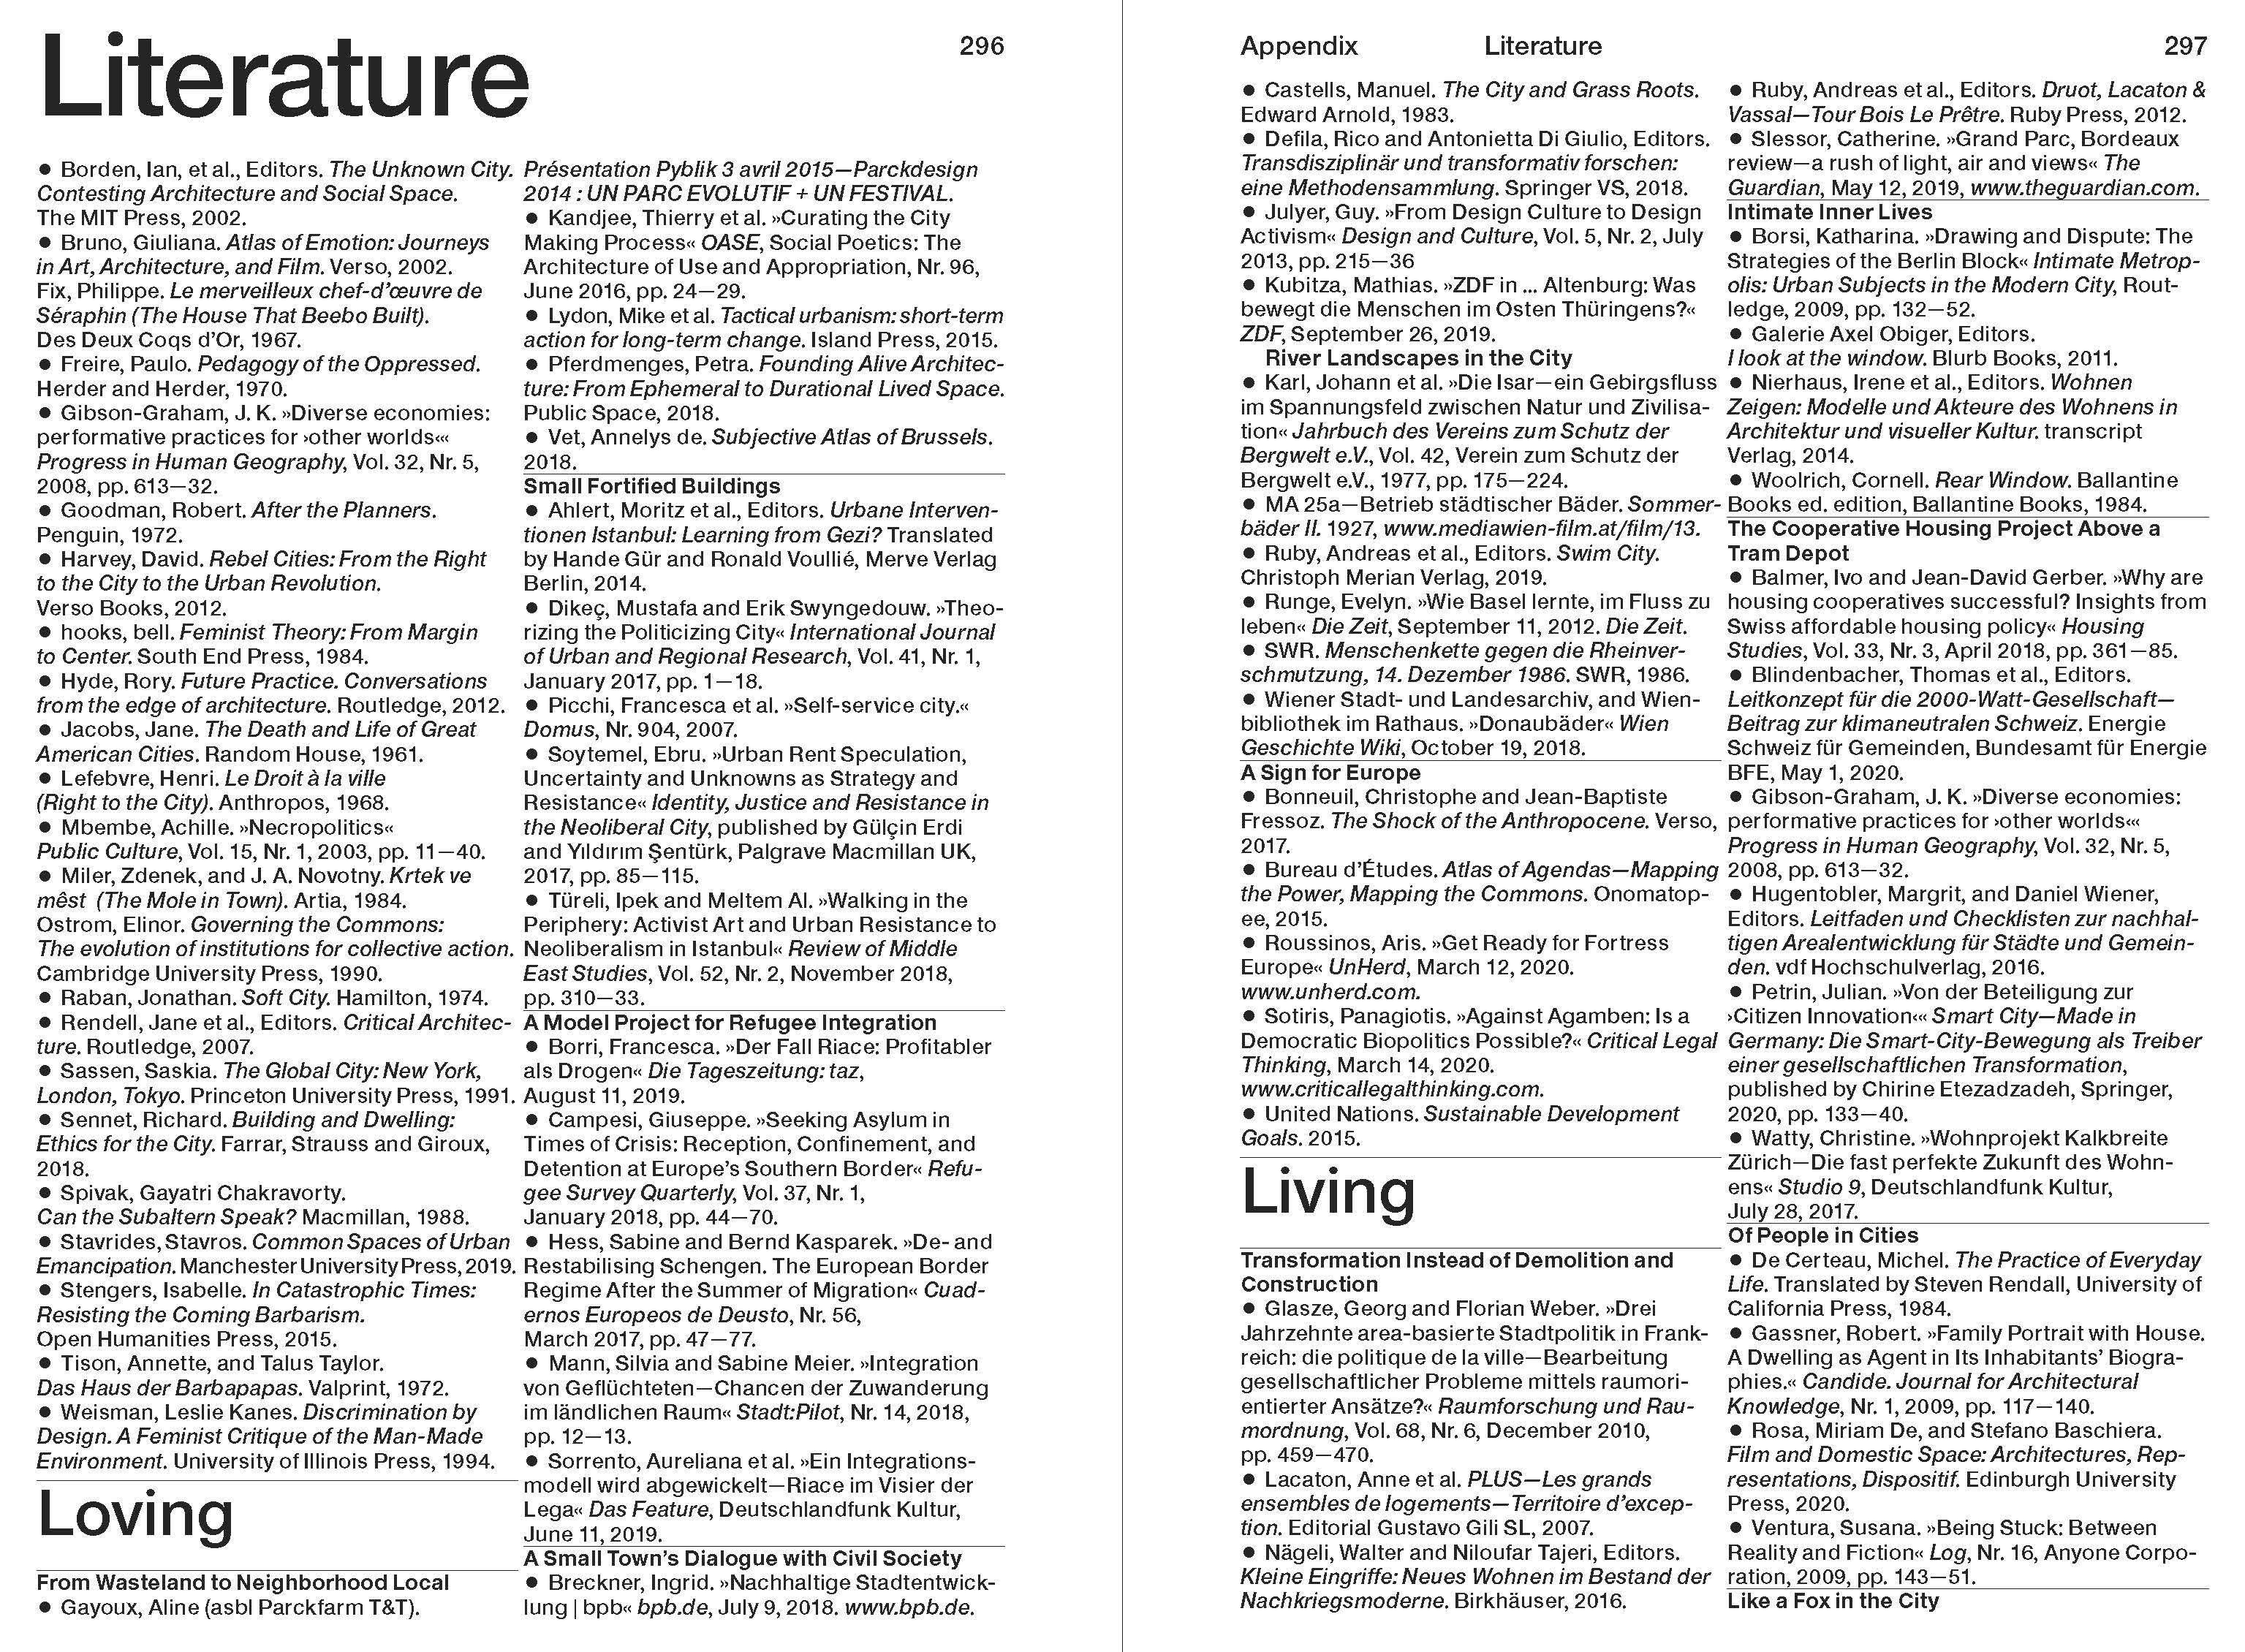 200817 EN Living the City Katalog FINAL Page 150